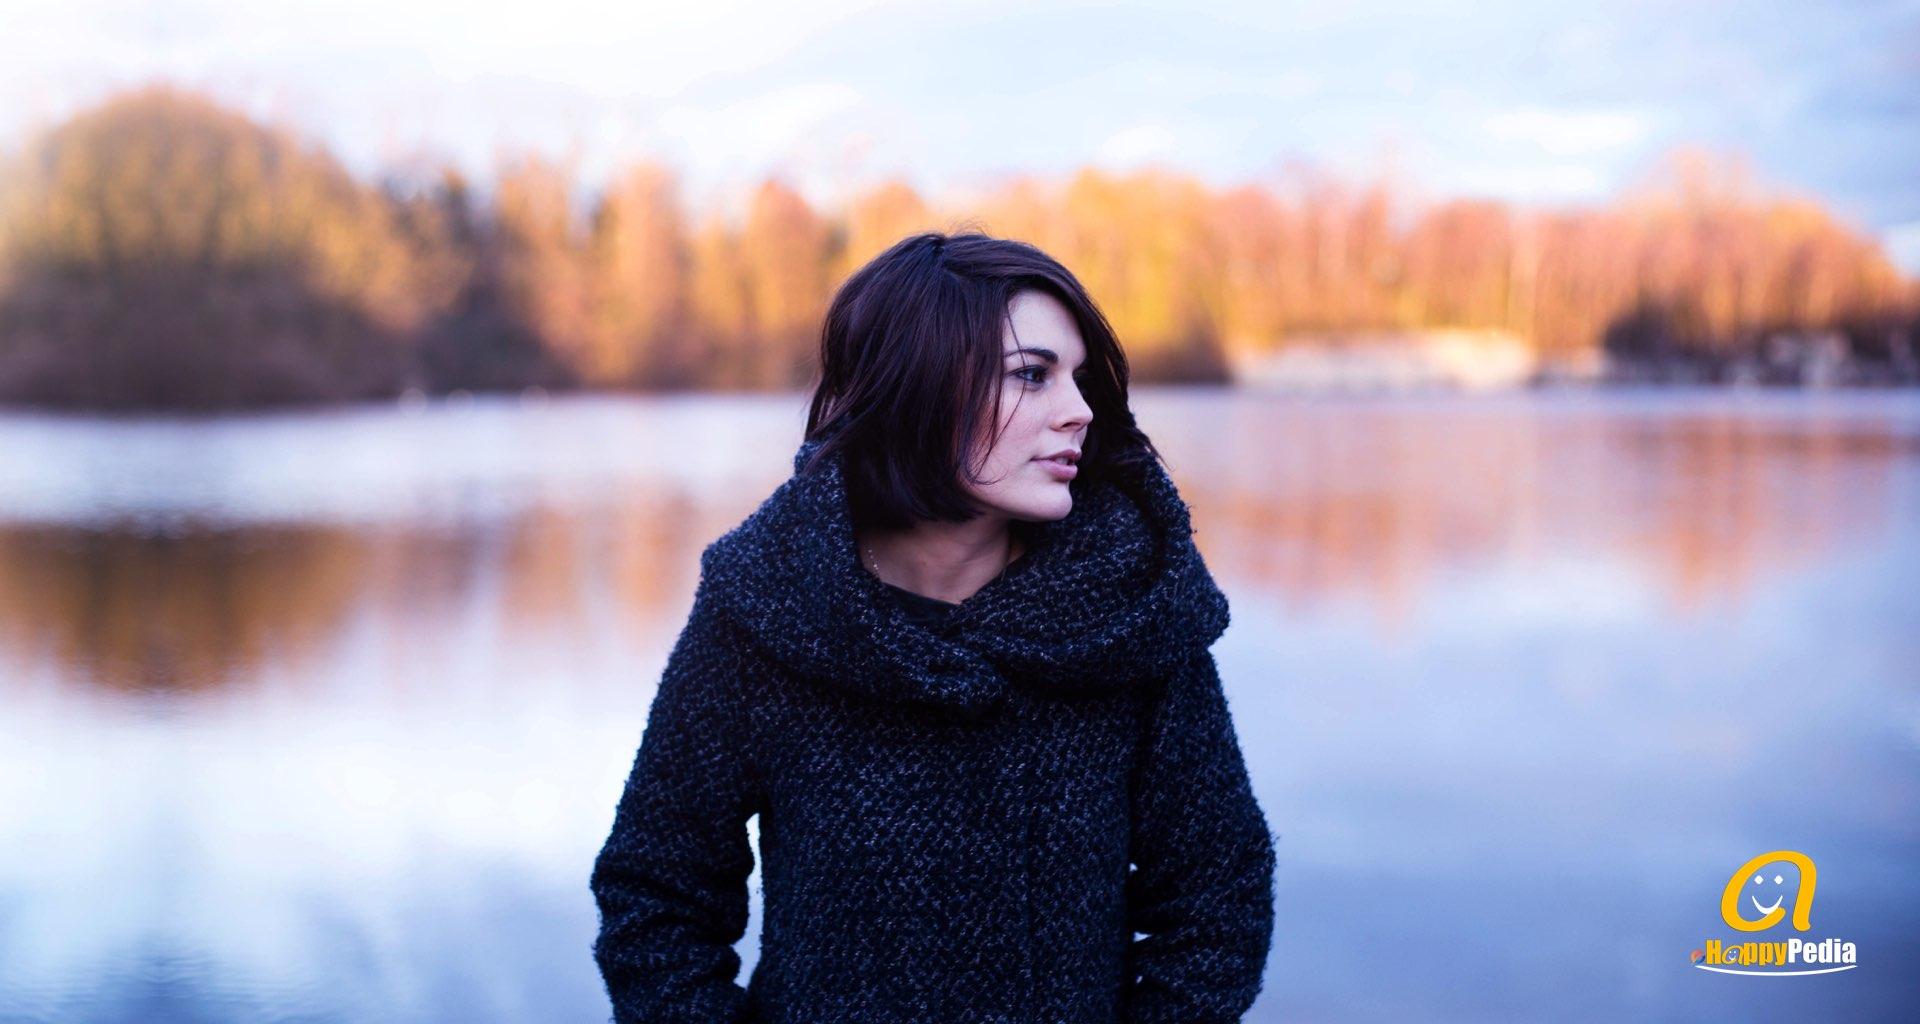 blog - woman lake autumn thinking.jpeg